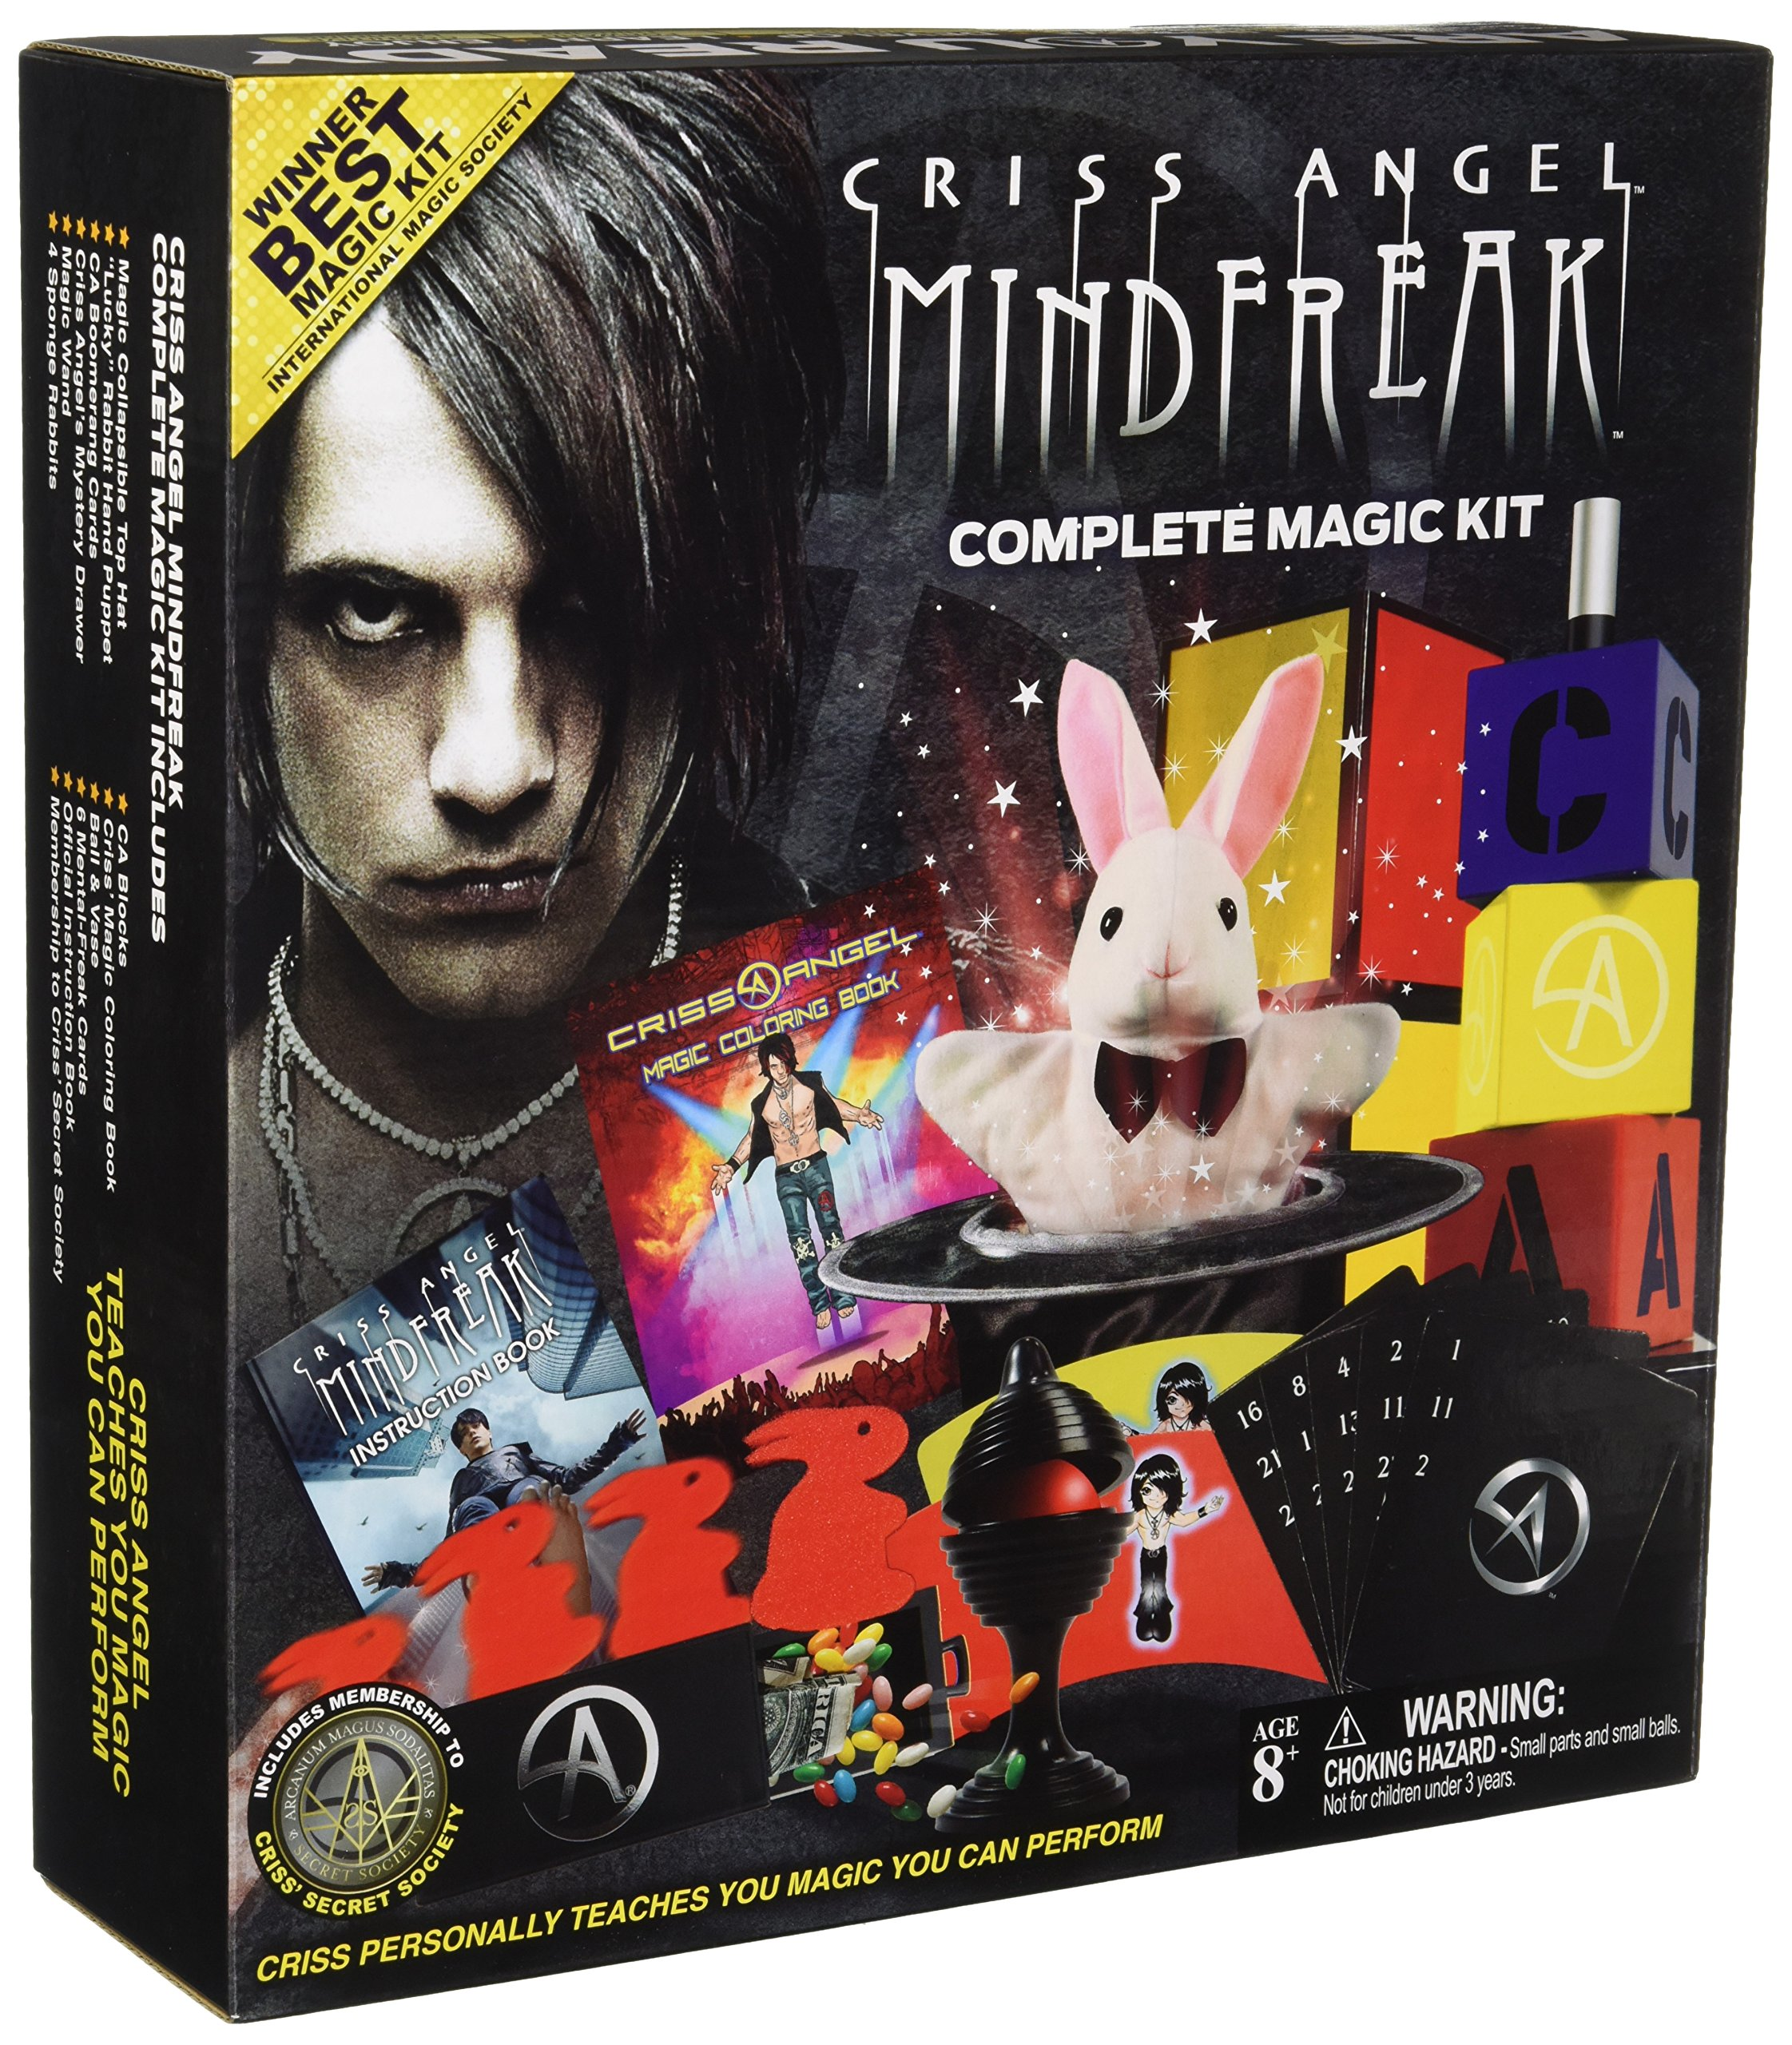 Criss Angel Complete Magic Kit